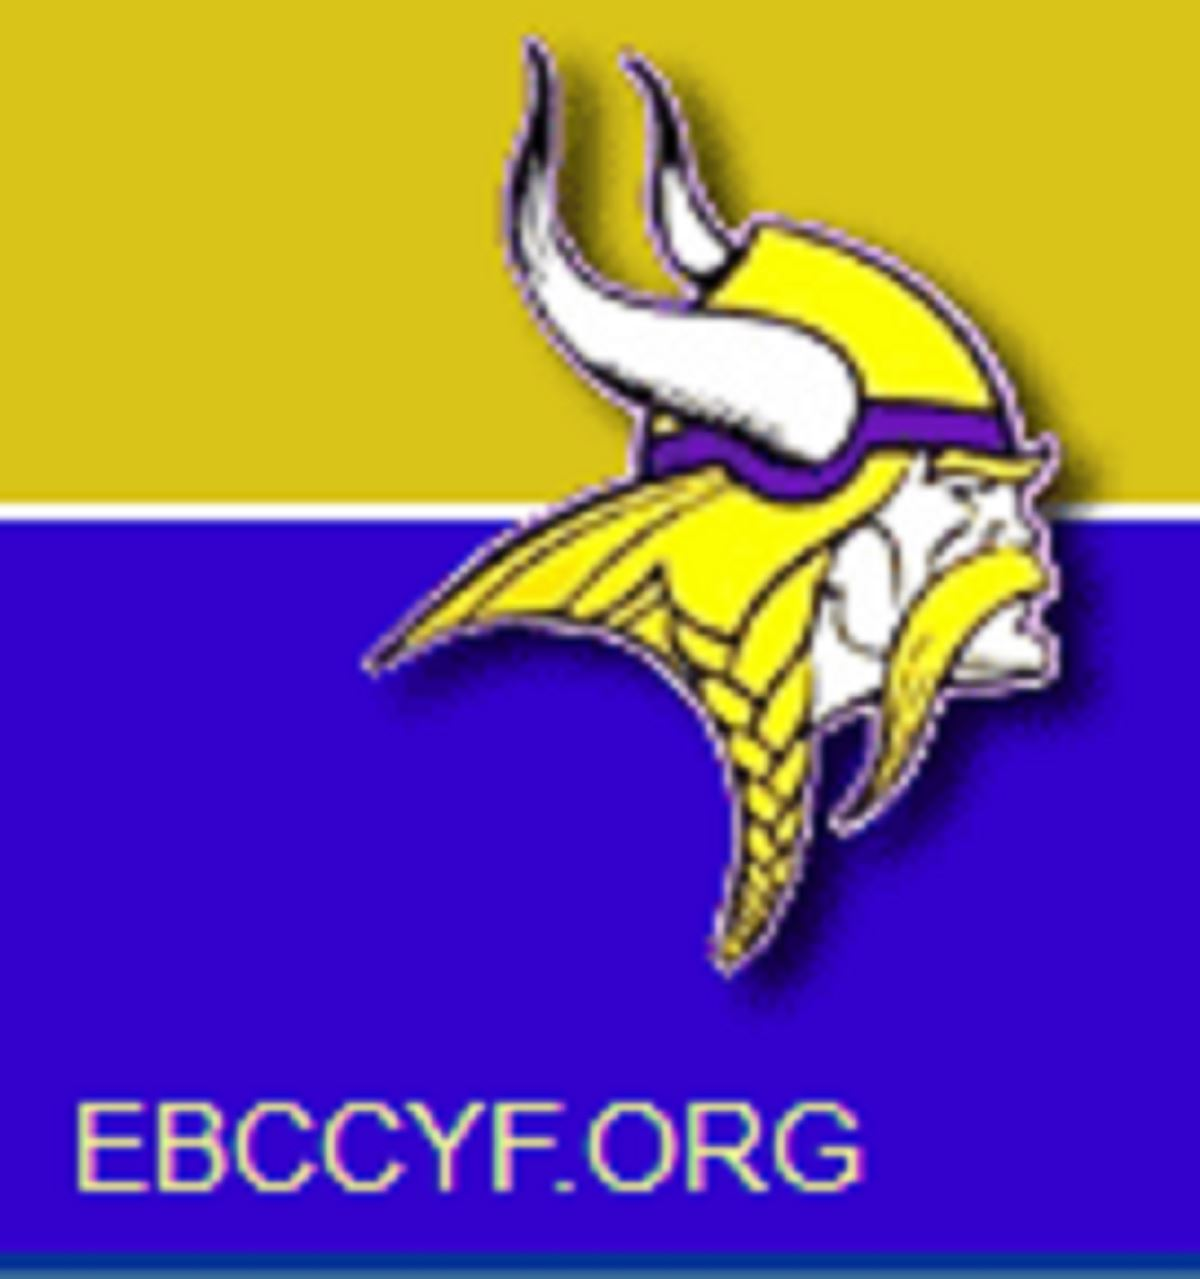 East Bridgewater Commercial Club Youth Football - EBCCYF Peewees